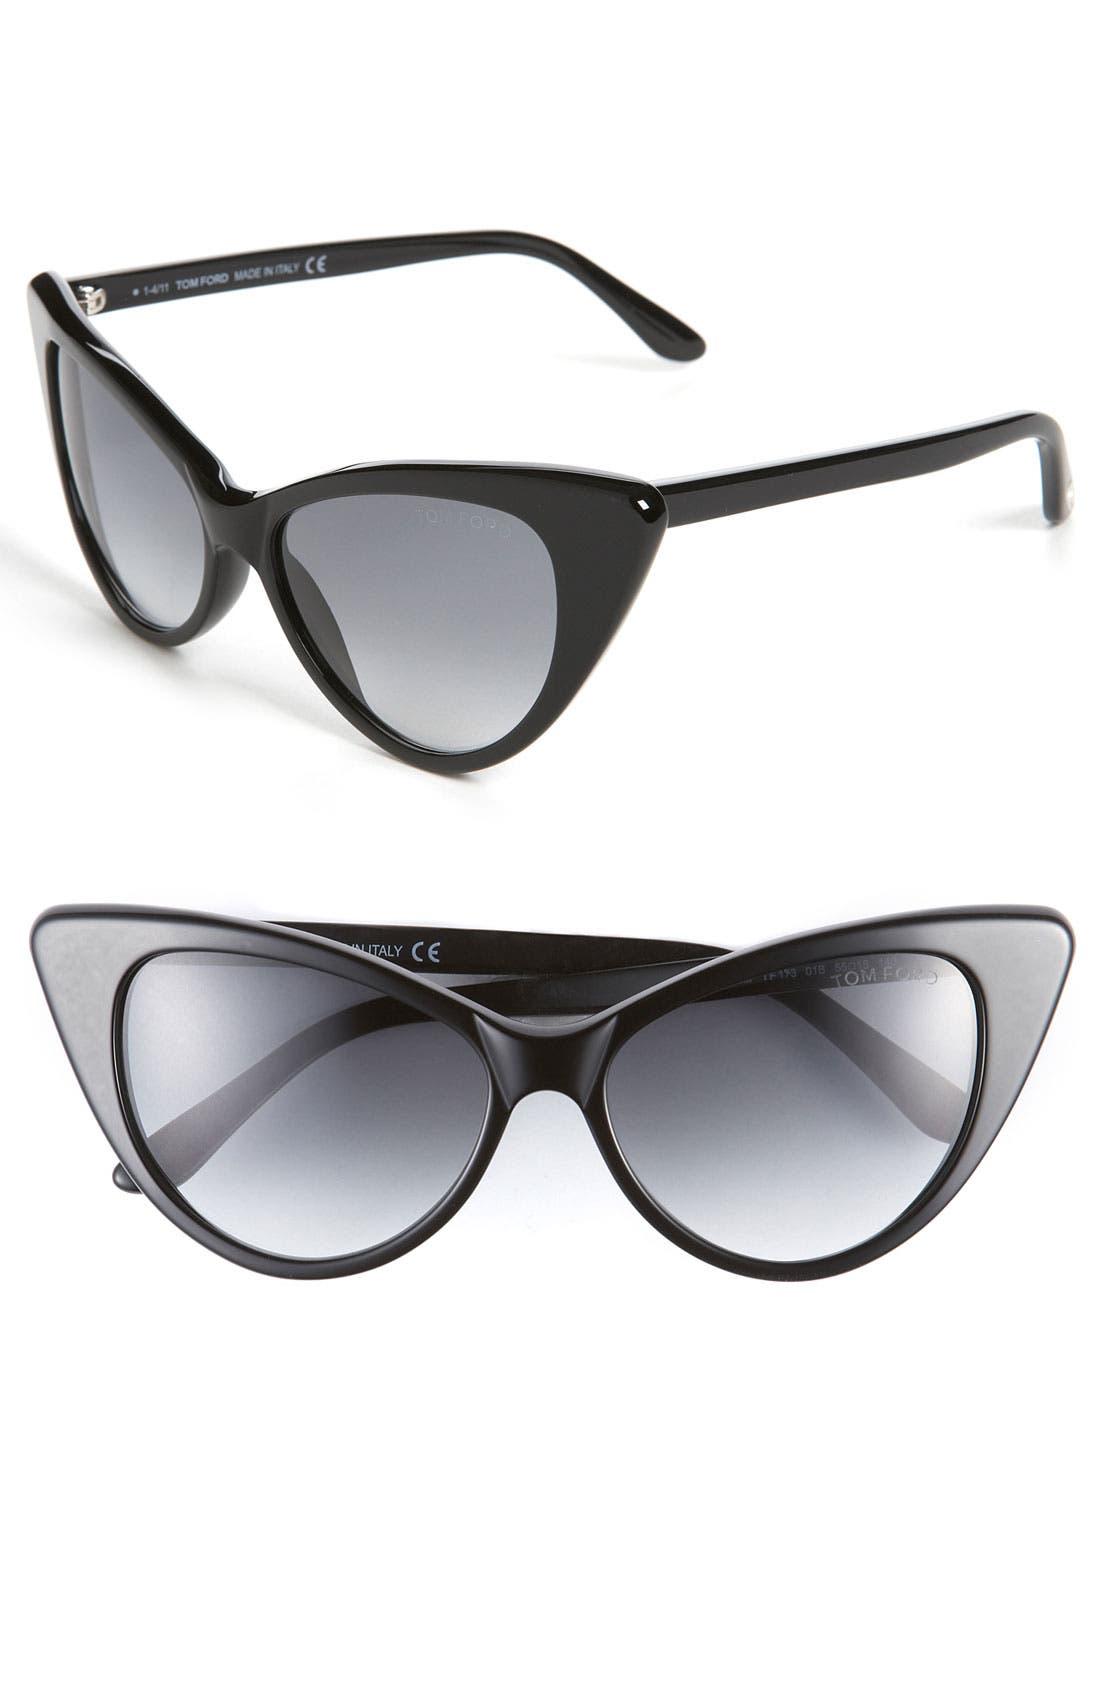 Plastic Cat's Eye Sunglasses,                         Main,                         color, Black/ Gradient Smoke